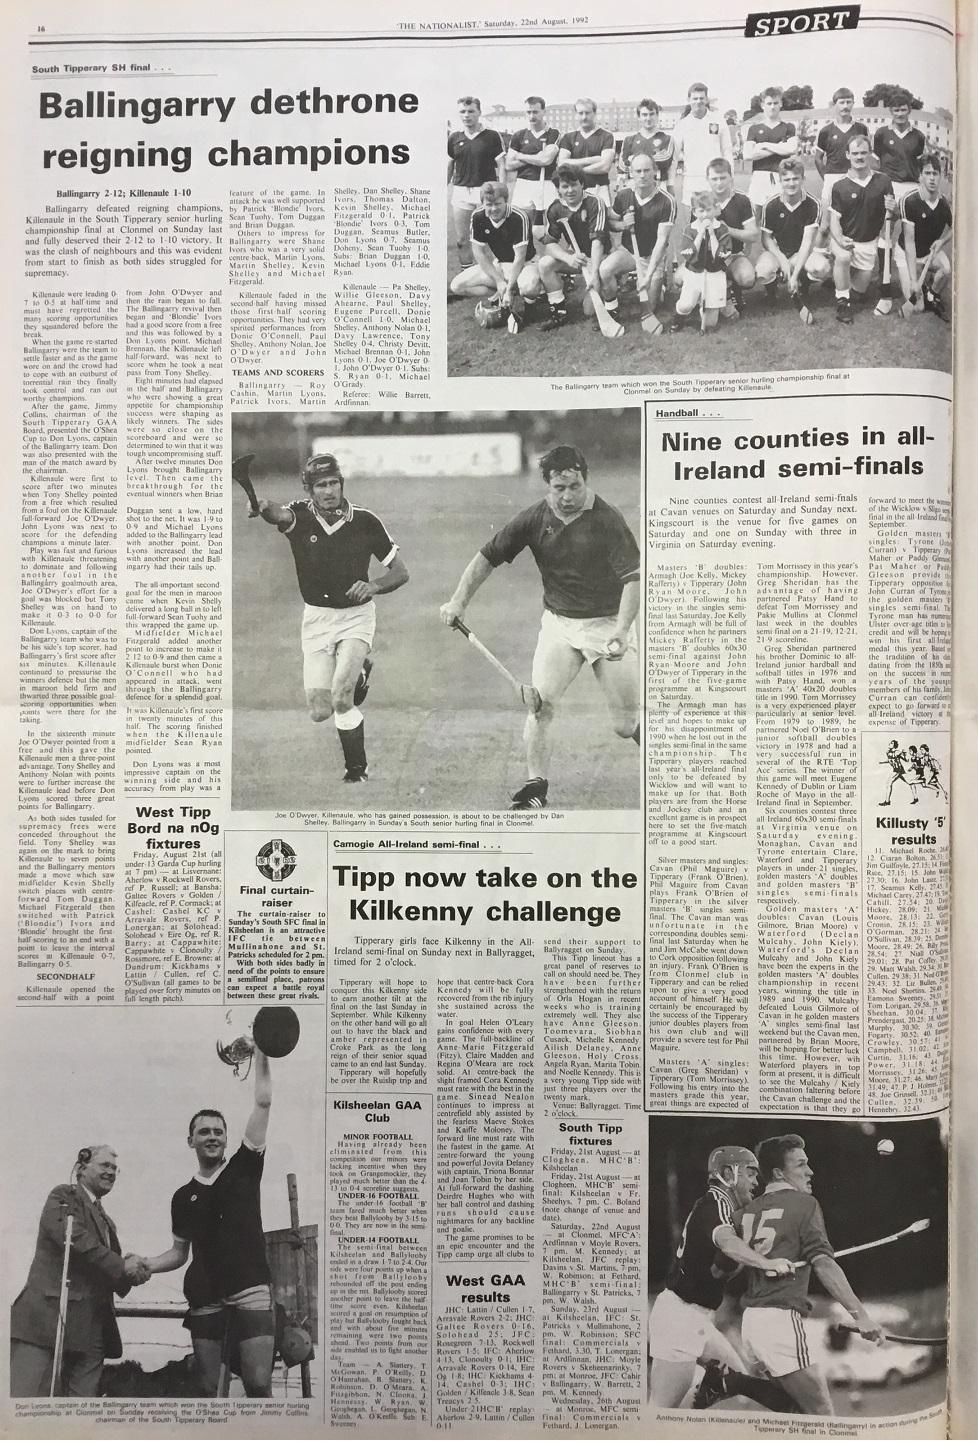 1992 South hurling final